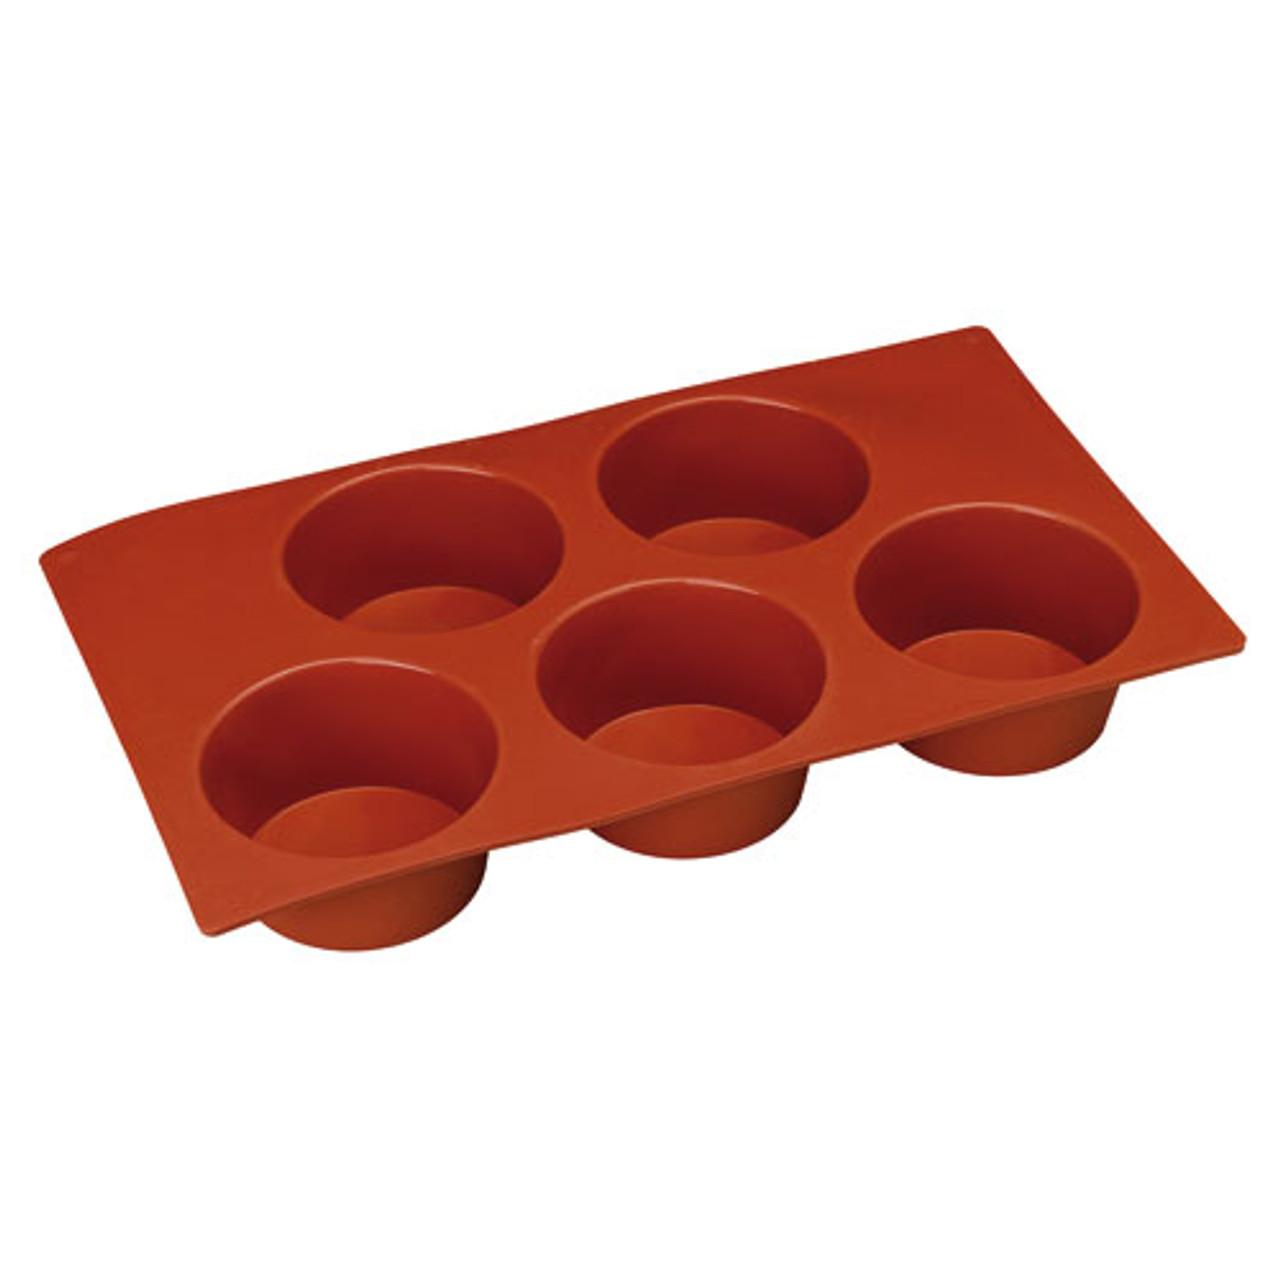 "N-Stick Silic. Mold, Muffin, DIA 3 1/8"" X H 1 3/8"", 5 OZ"